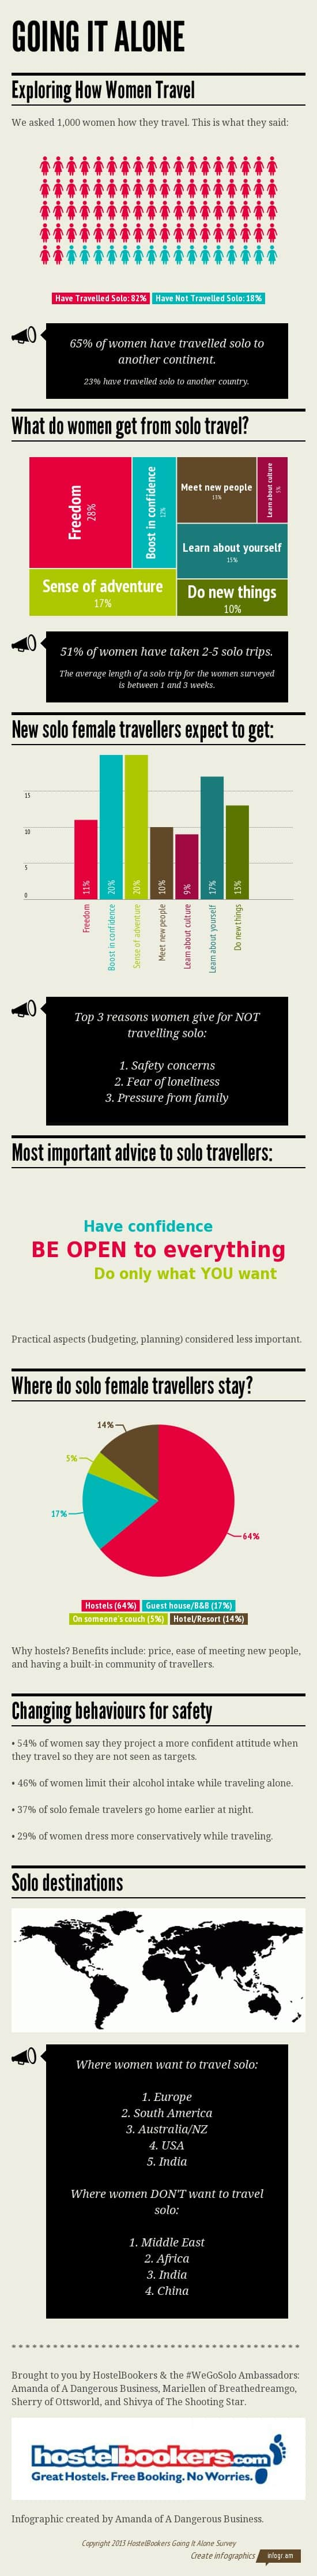 Women still love to travel solo